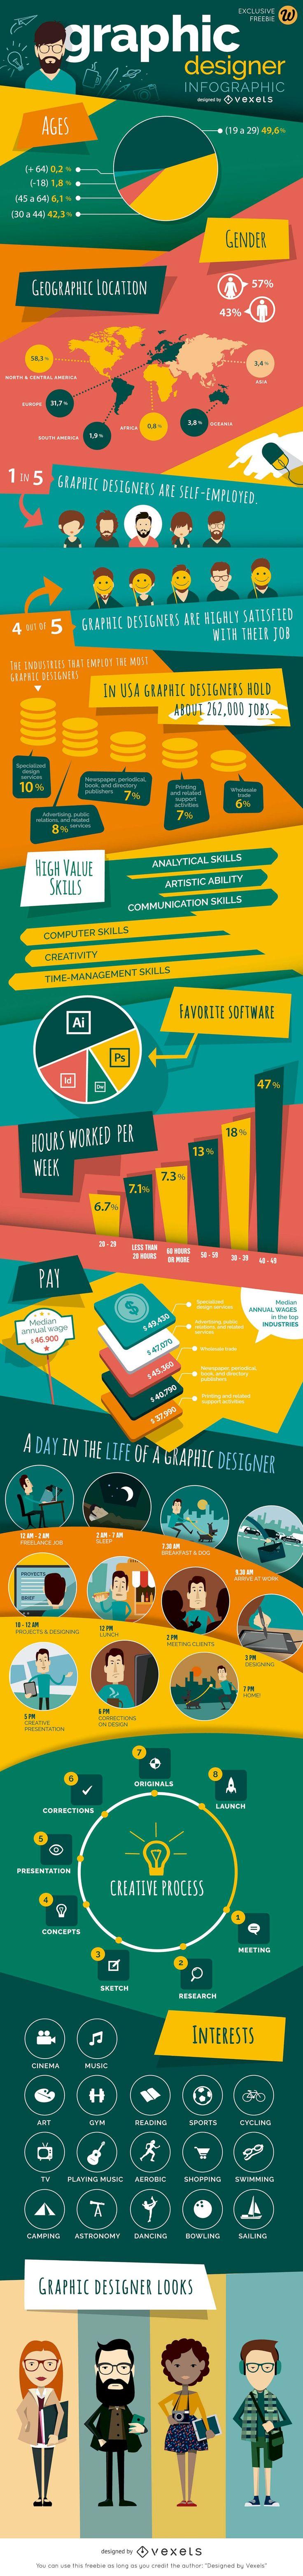 94 Stunning Infographic Designs https://www.designlisticle.com/infographic-designs-3/